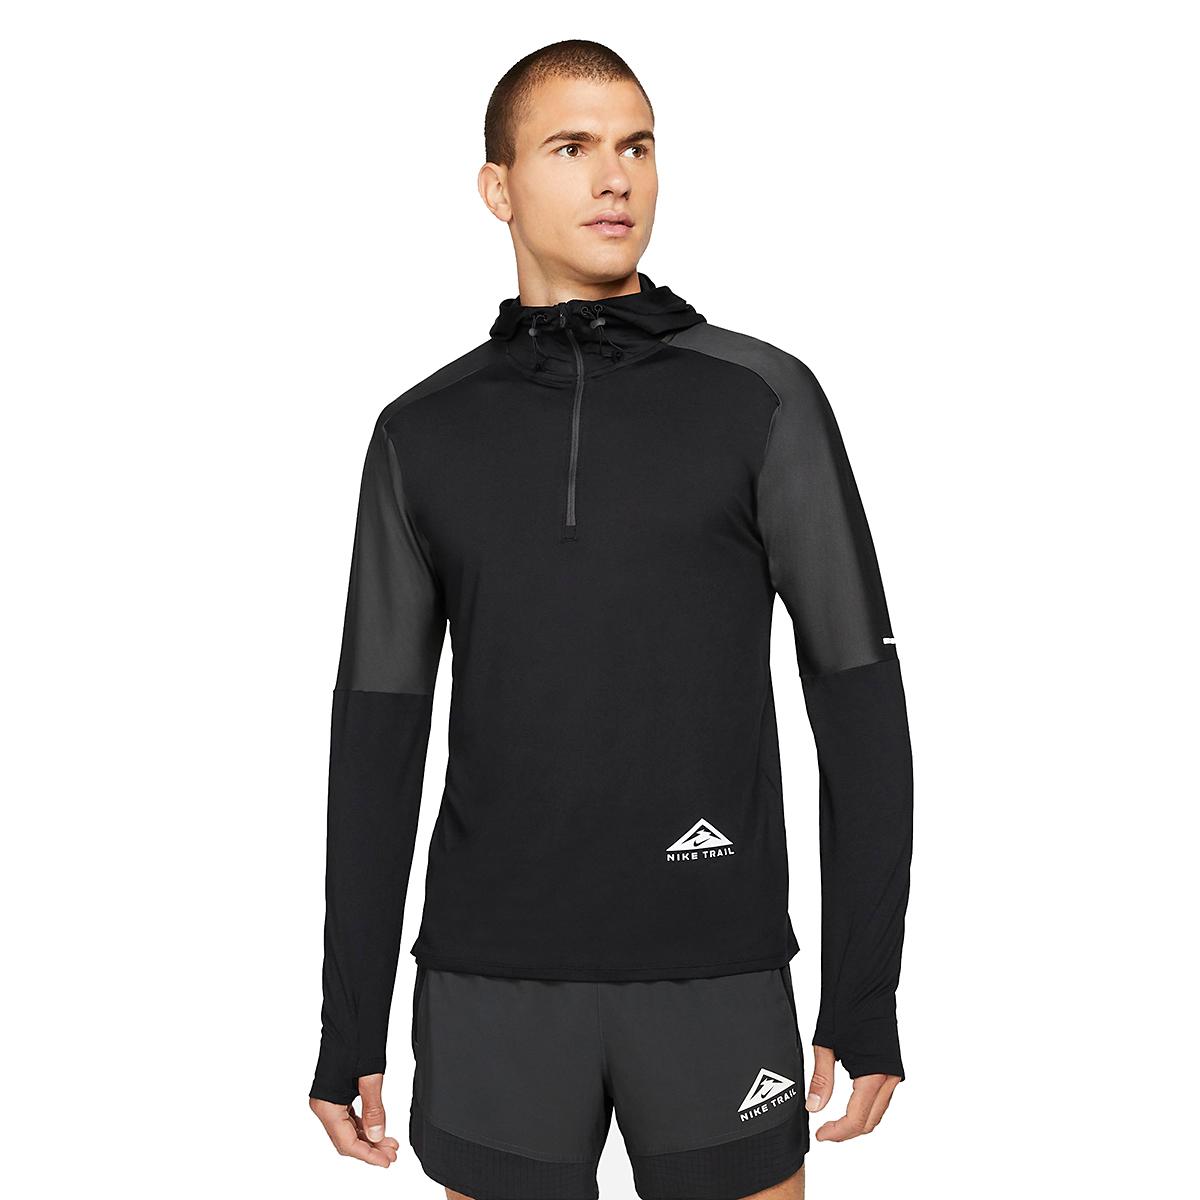 Men's Nike Dri-FIT Element 1/2-Zip Trail Running Top - Color: Black/Black/Dark Smoke Grey/White - Size: XS, Black/Black/Dark Smoke Grey/White, large, image 1